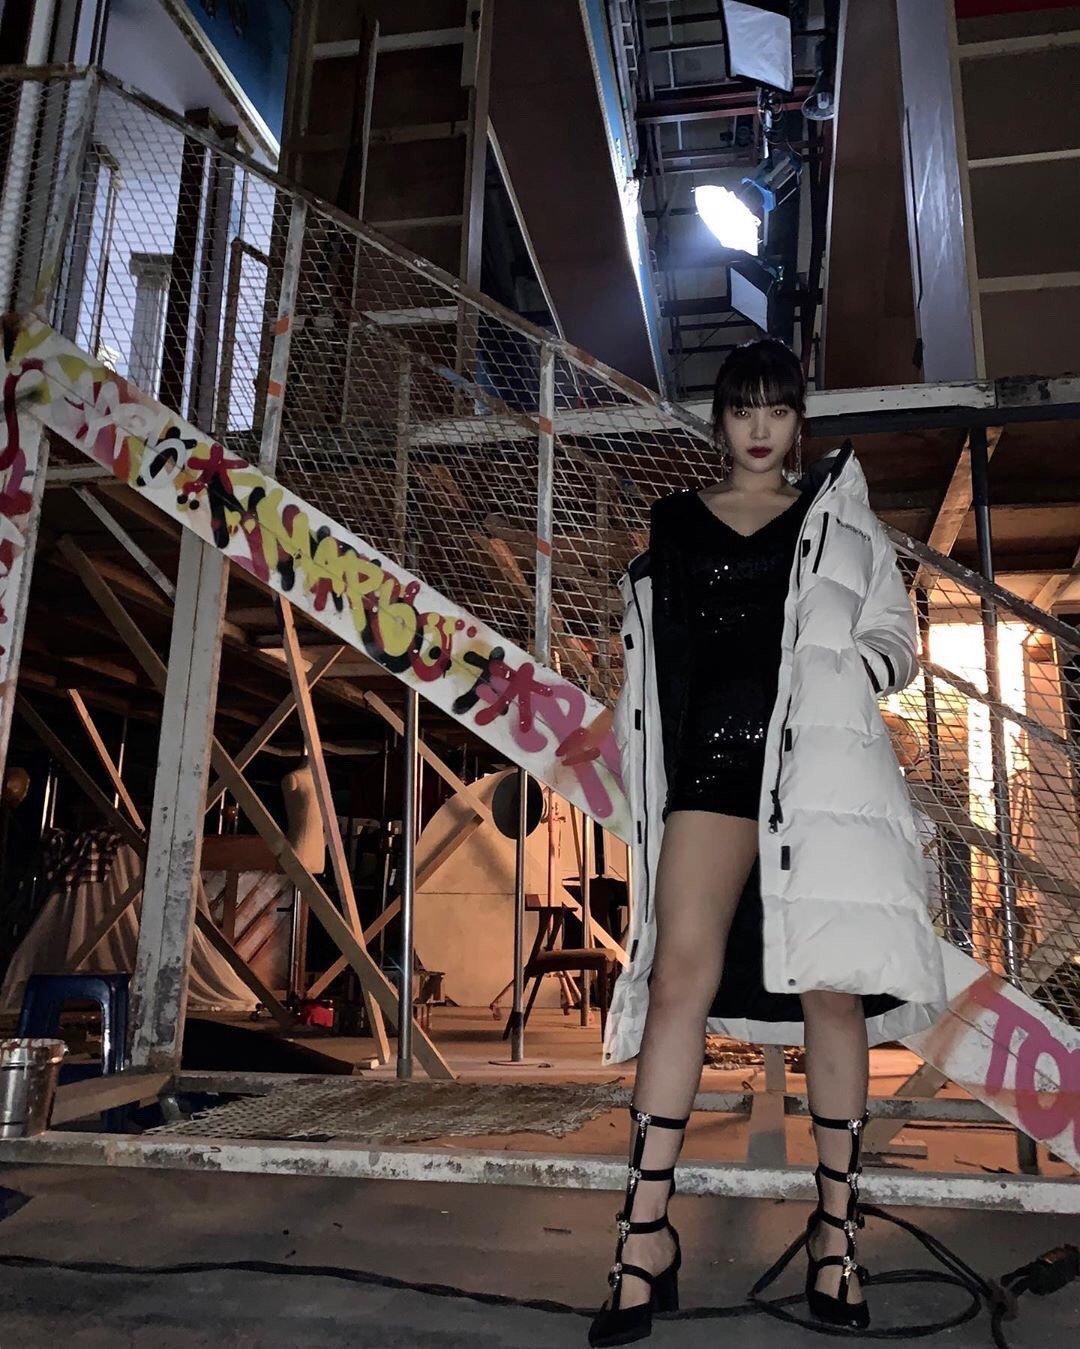 [Red Velvet][分享]191209 这程度的美貌简直在杀人!Joy的极致诱惑!